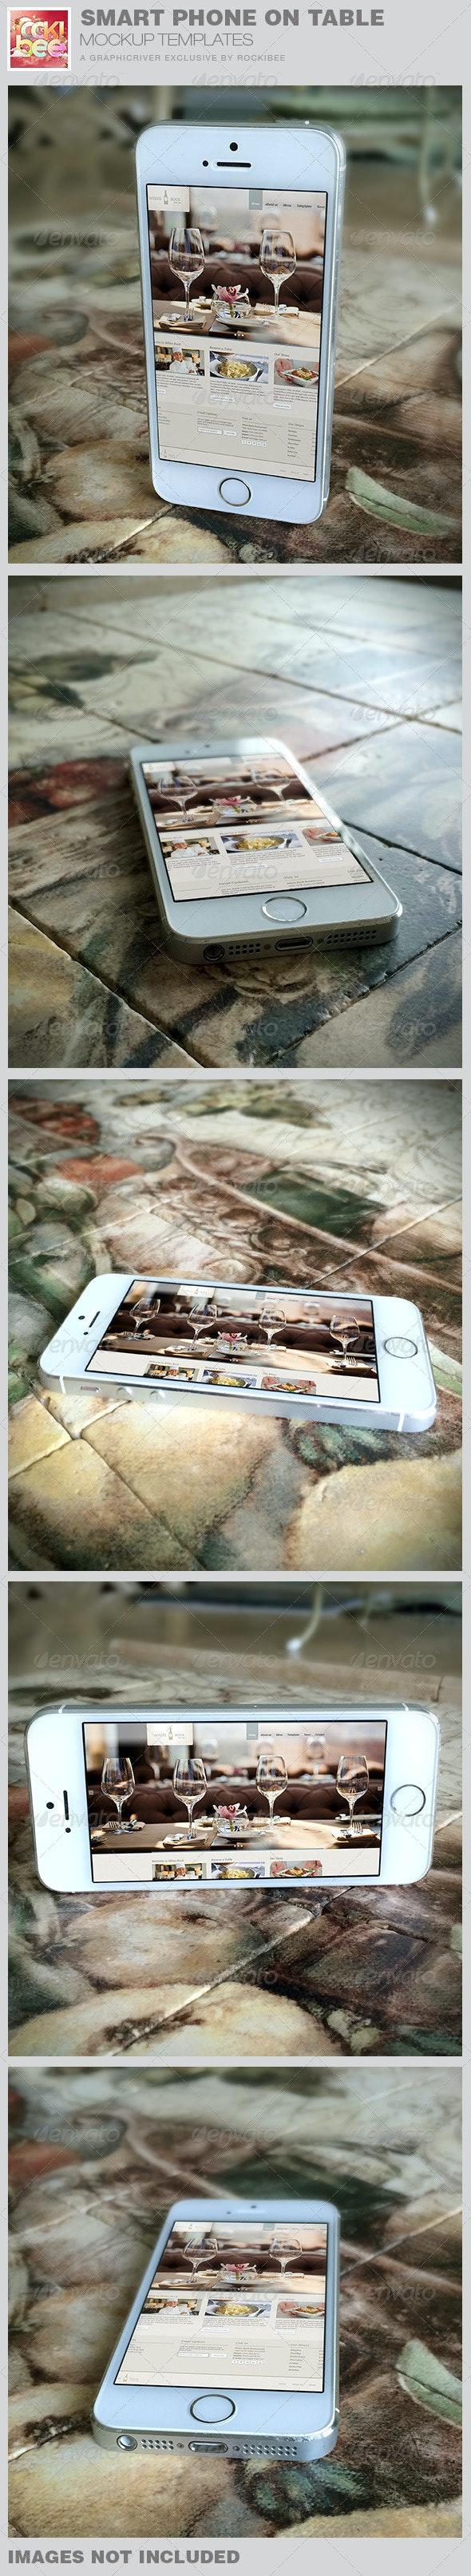 Smart Phone on Table Mockup Templates - Mobile Displays